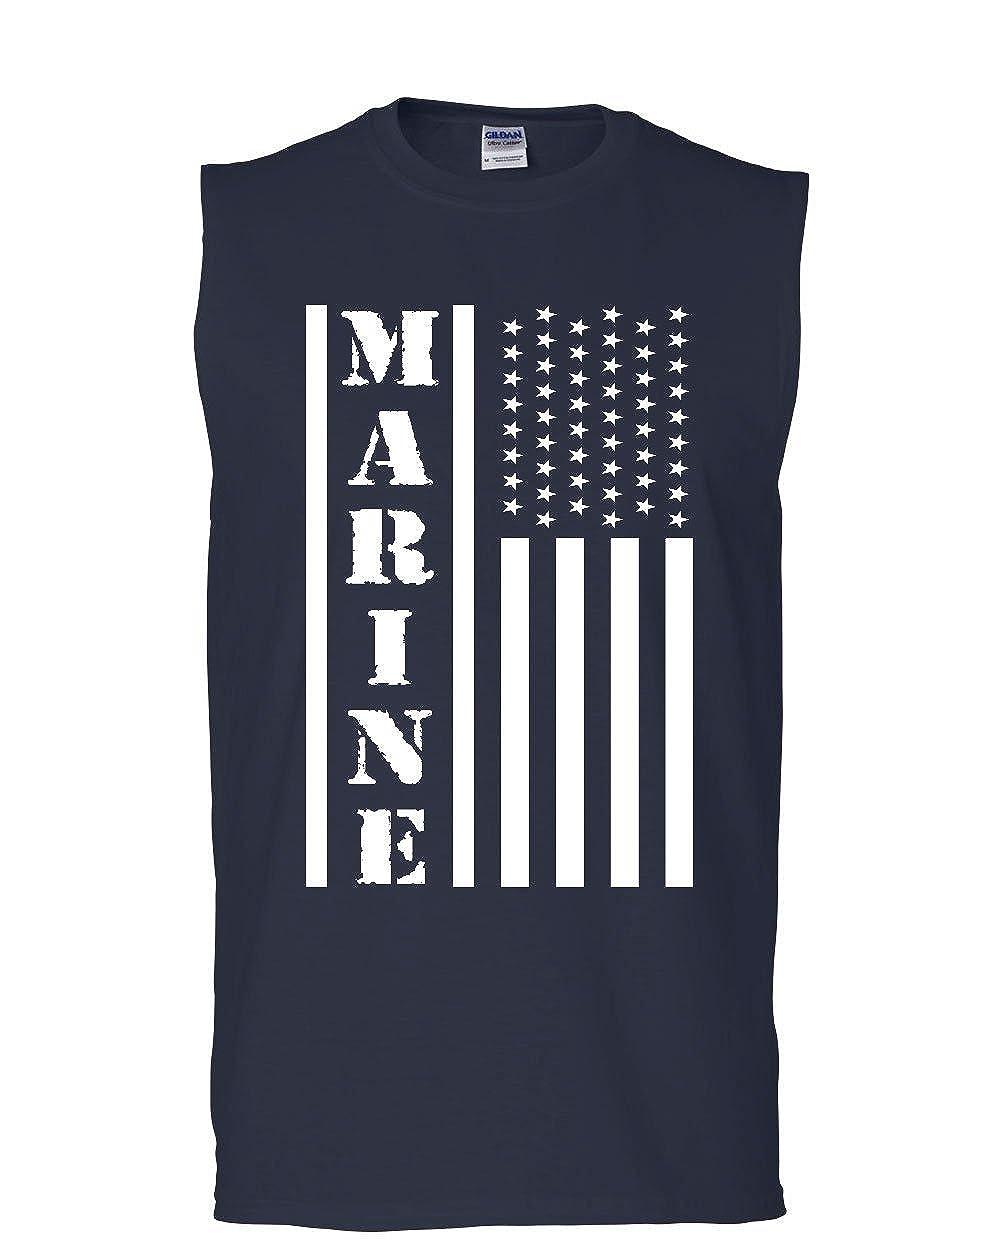 Tee Hunt Marine Flag Military Muscle Shirt Patriot Stars /& Stripes POW MIA Sleeveless